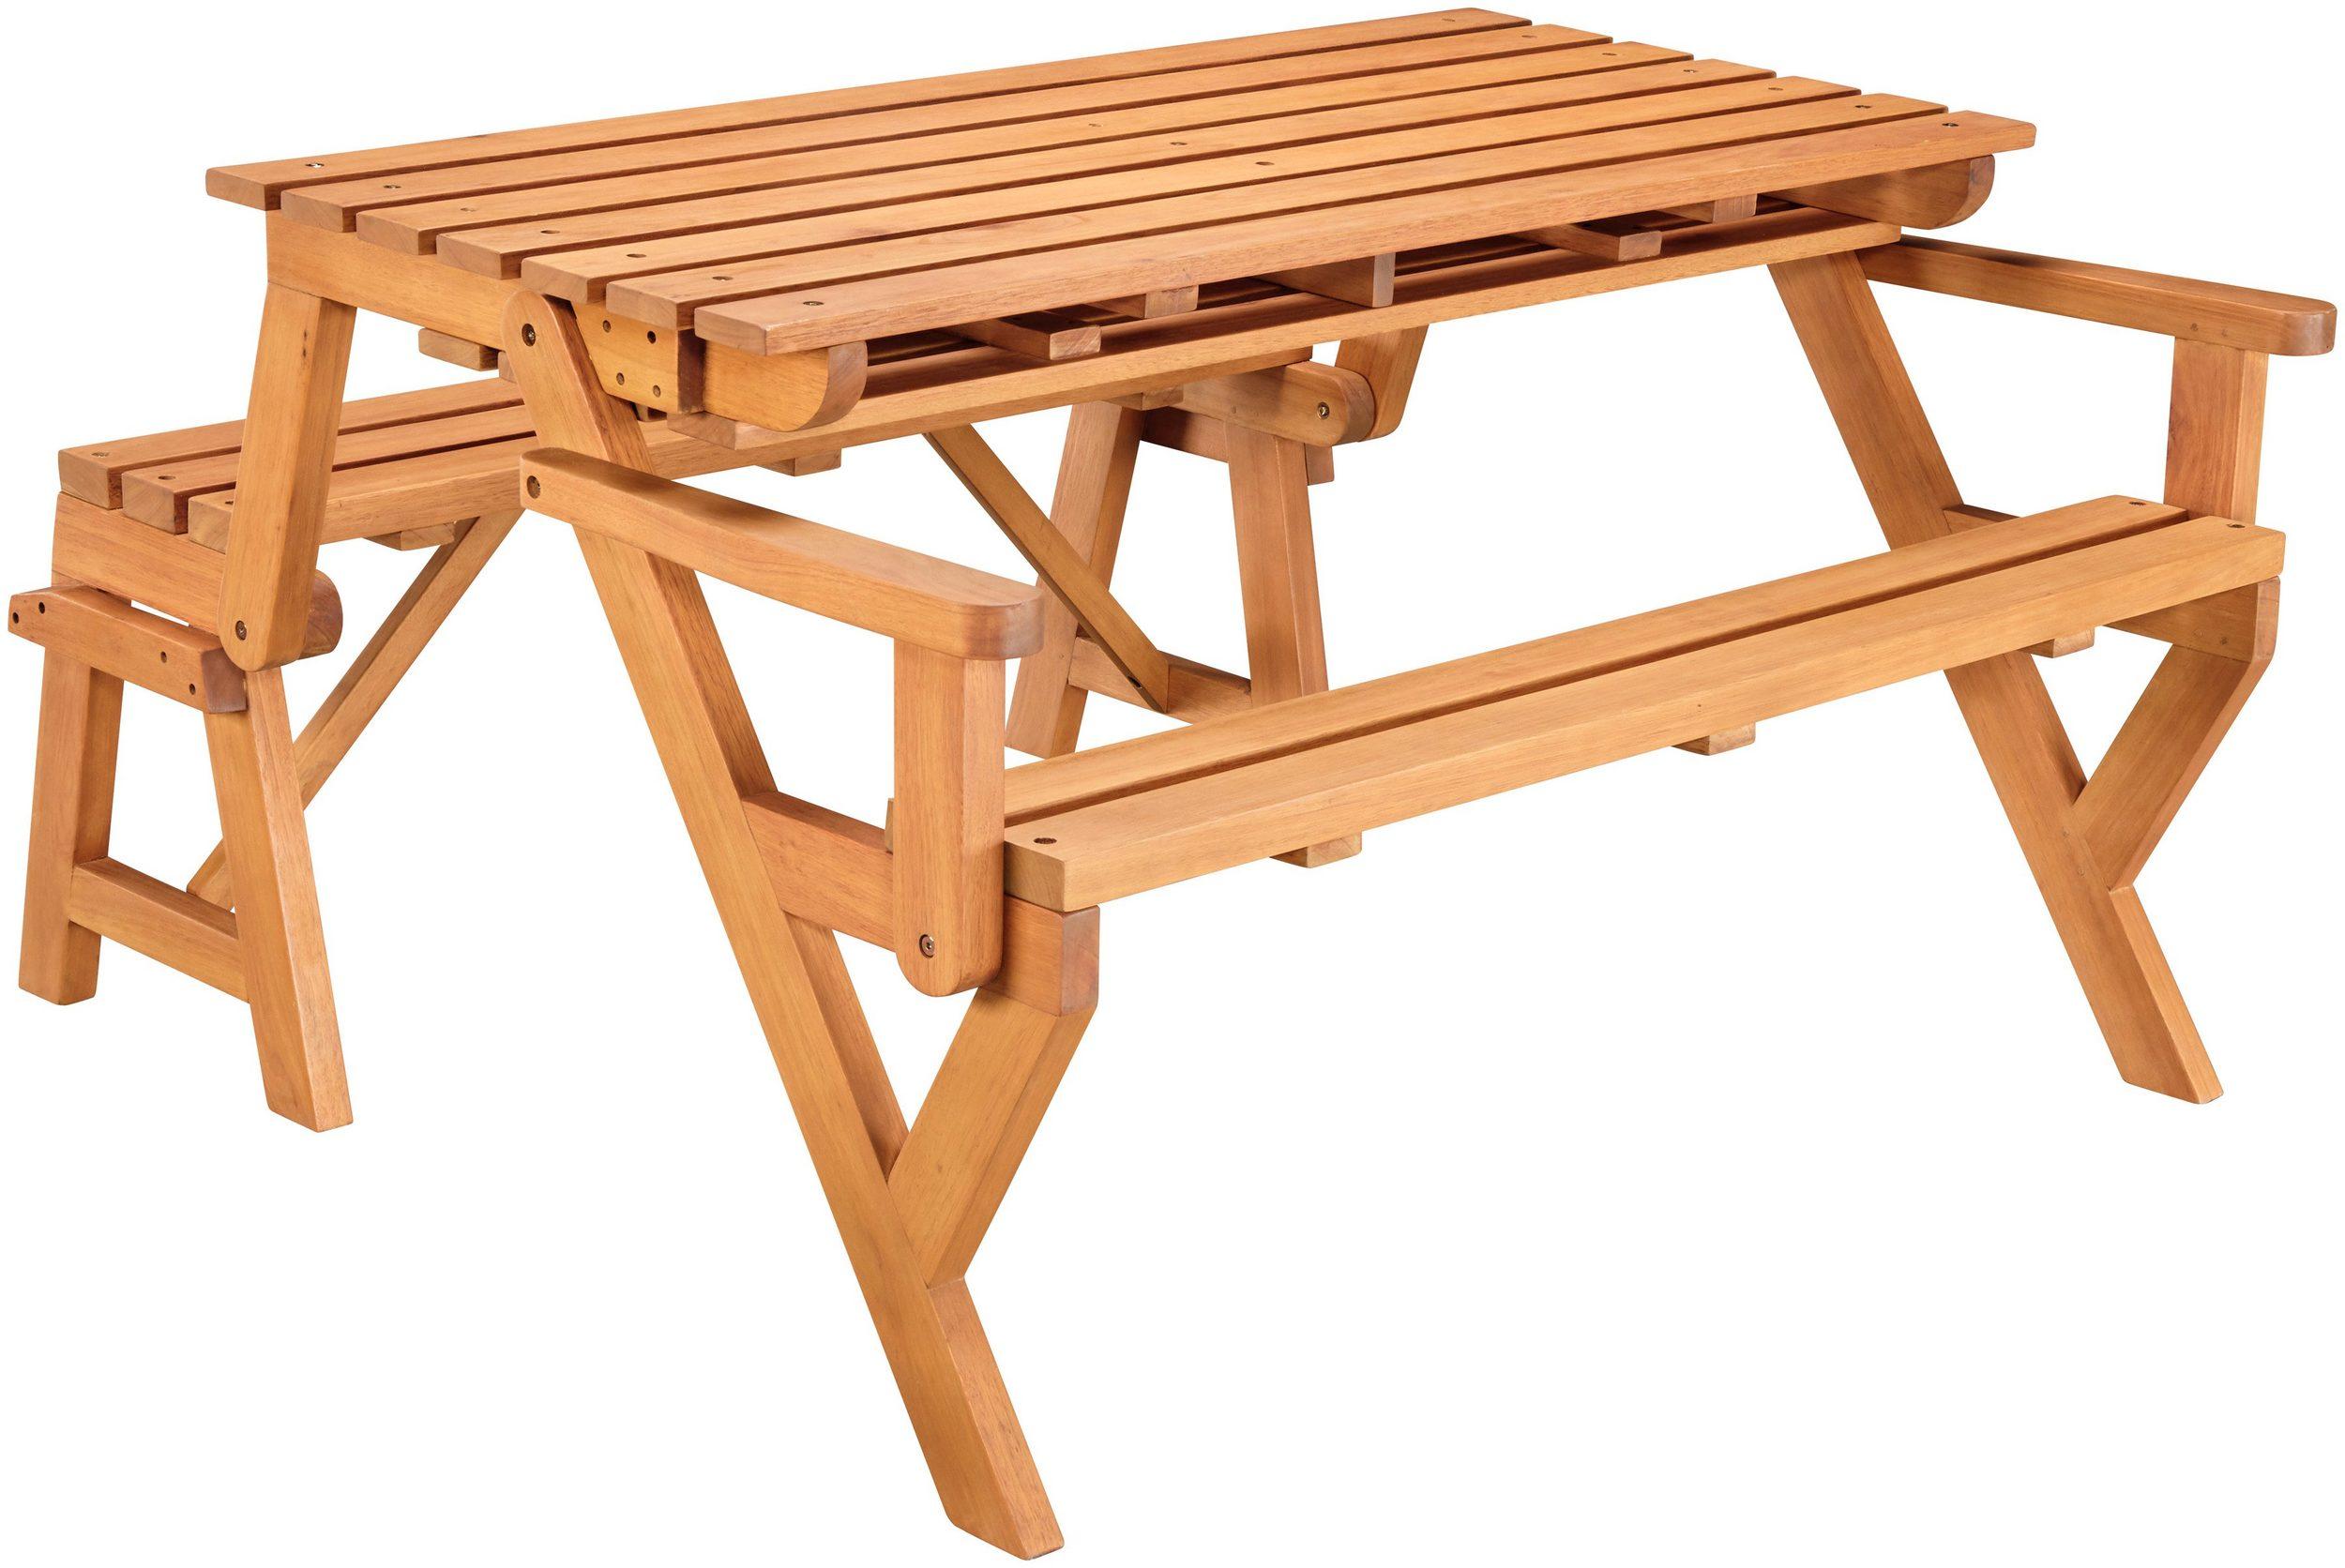 Gartenbank Sitzbank Gartengarnitur Eukalyptus Holz 7150507